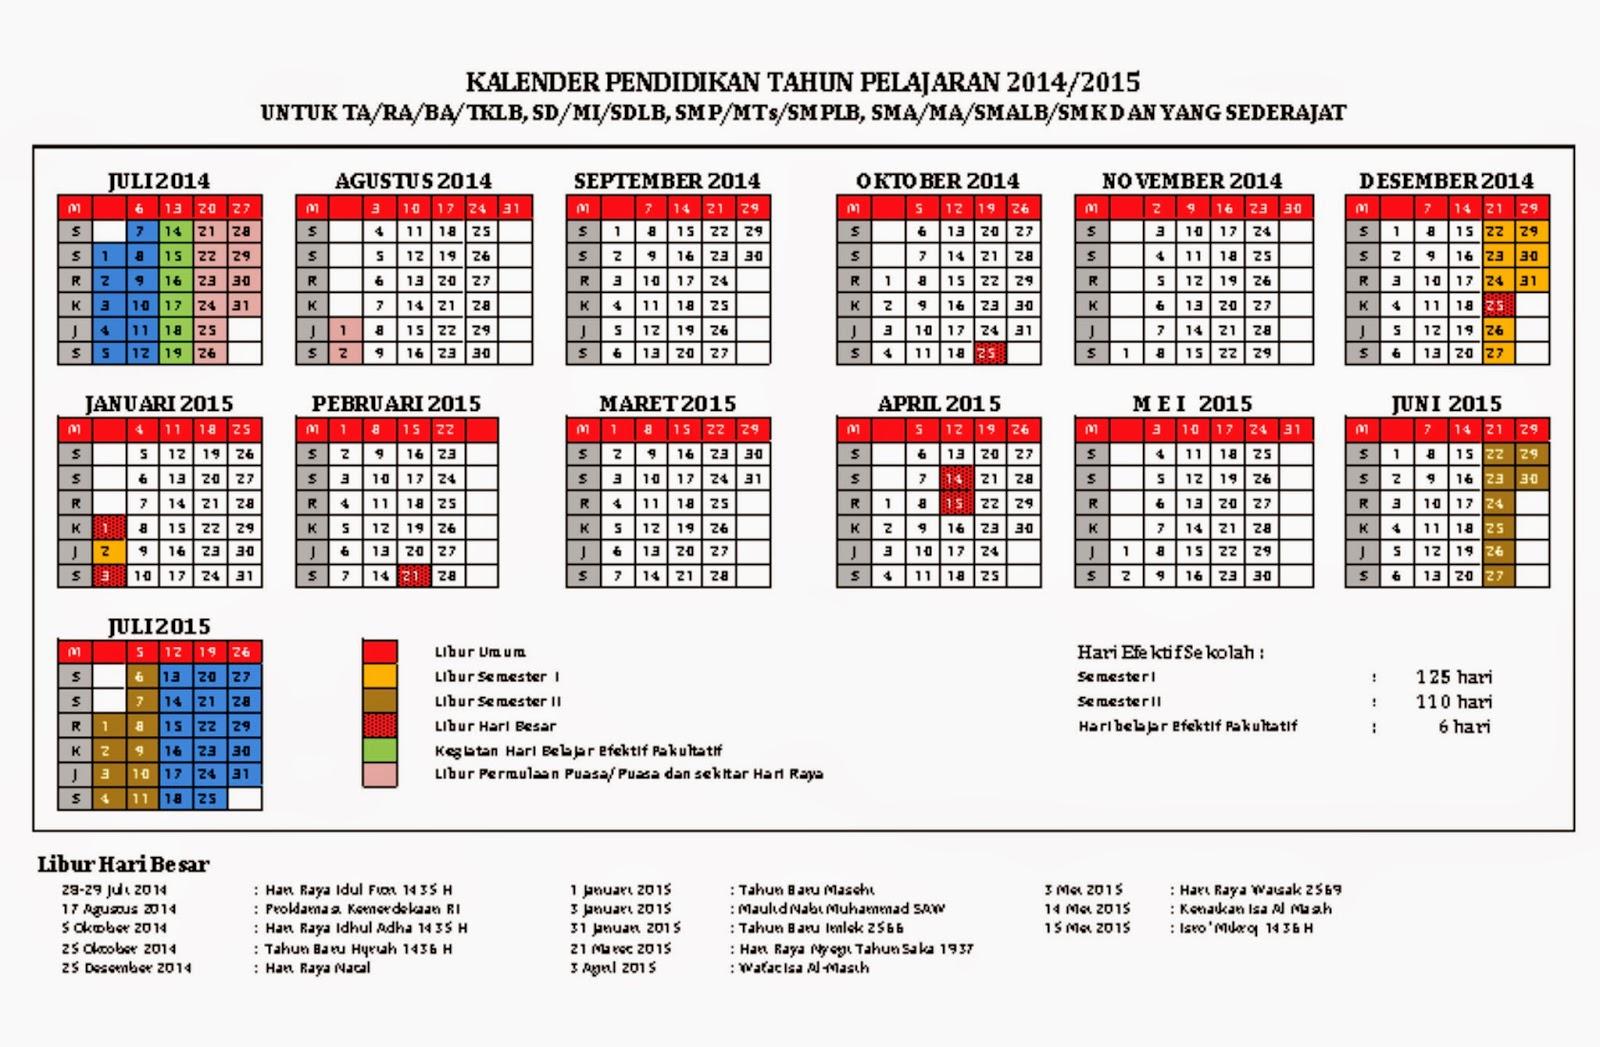 Kalender pendidikan tahun pelajaran 2014 2015